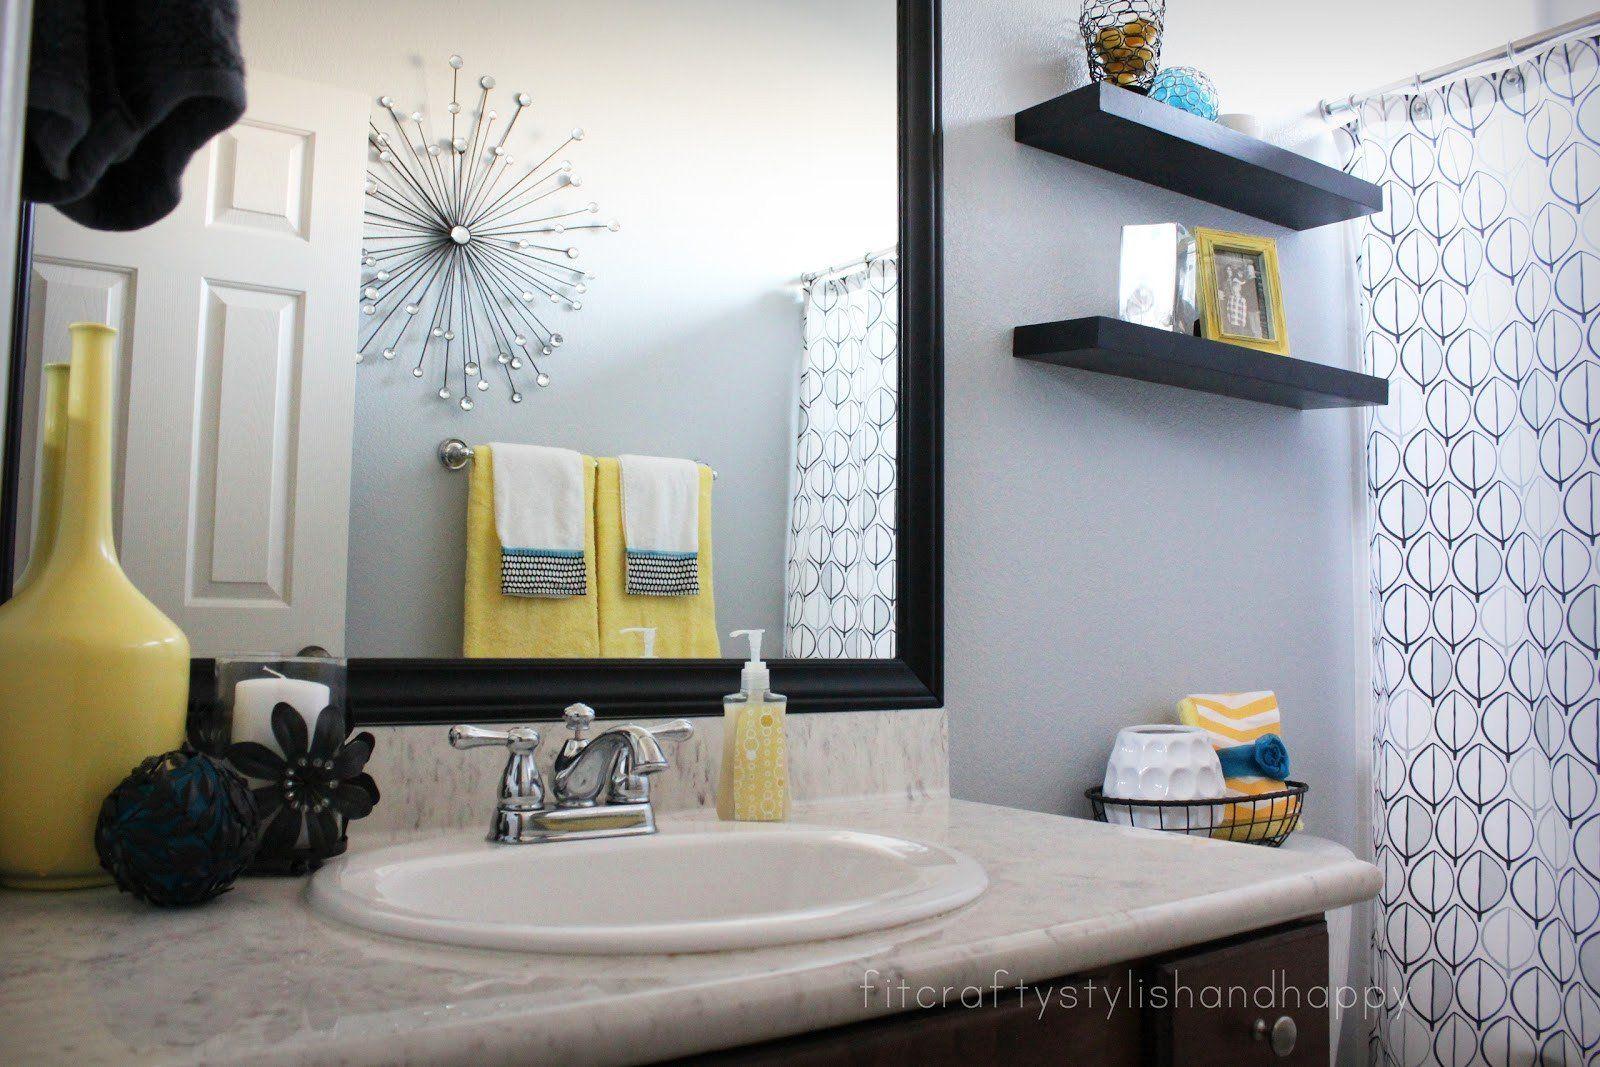 Black And Gray Bathroom Decor Inspirational Fit Crafty Stylish And Happy Guest Bathroom Makeover In 2020 Yellow Bathroom Decor Gray Bathroom Decor Yellow Bathrooms